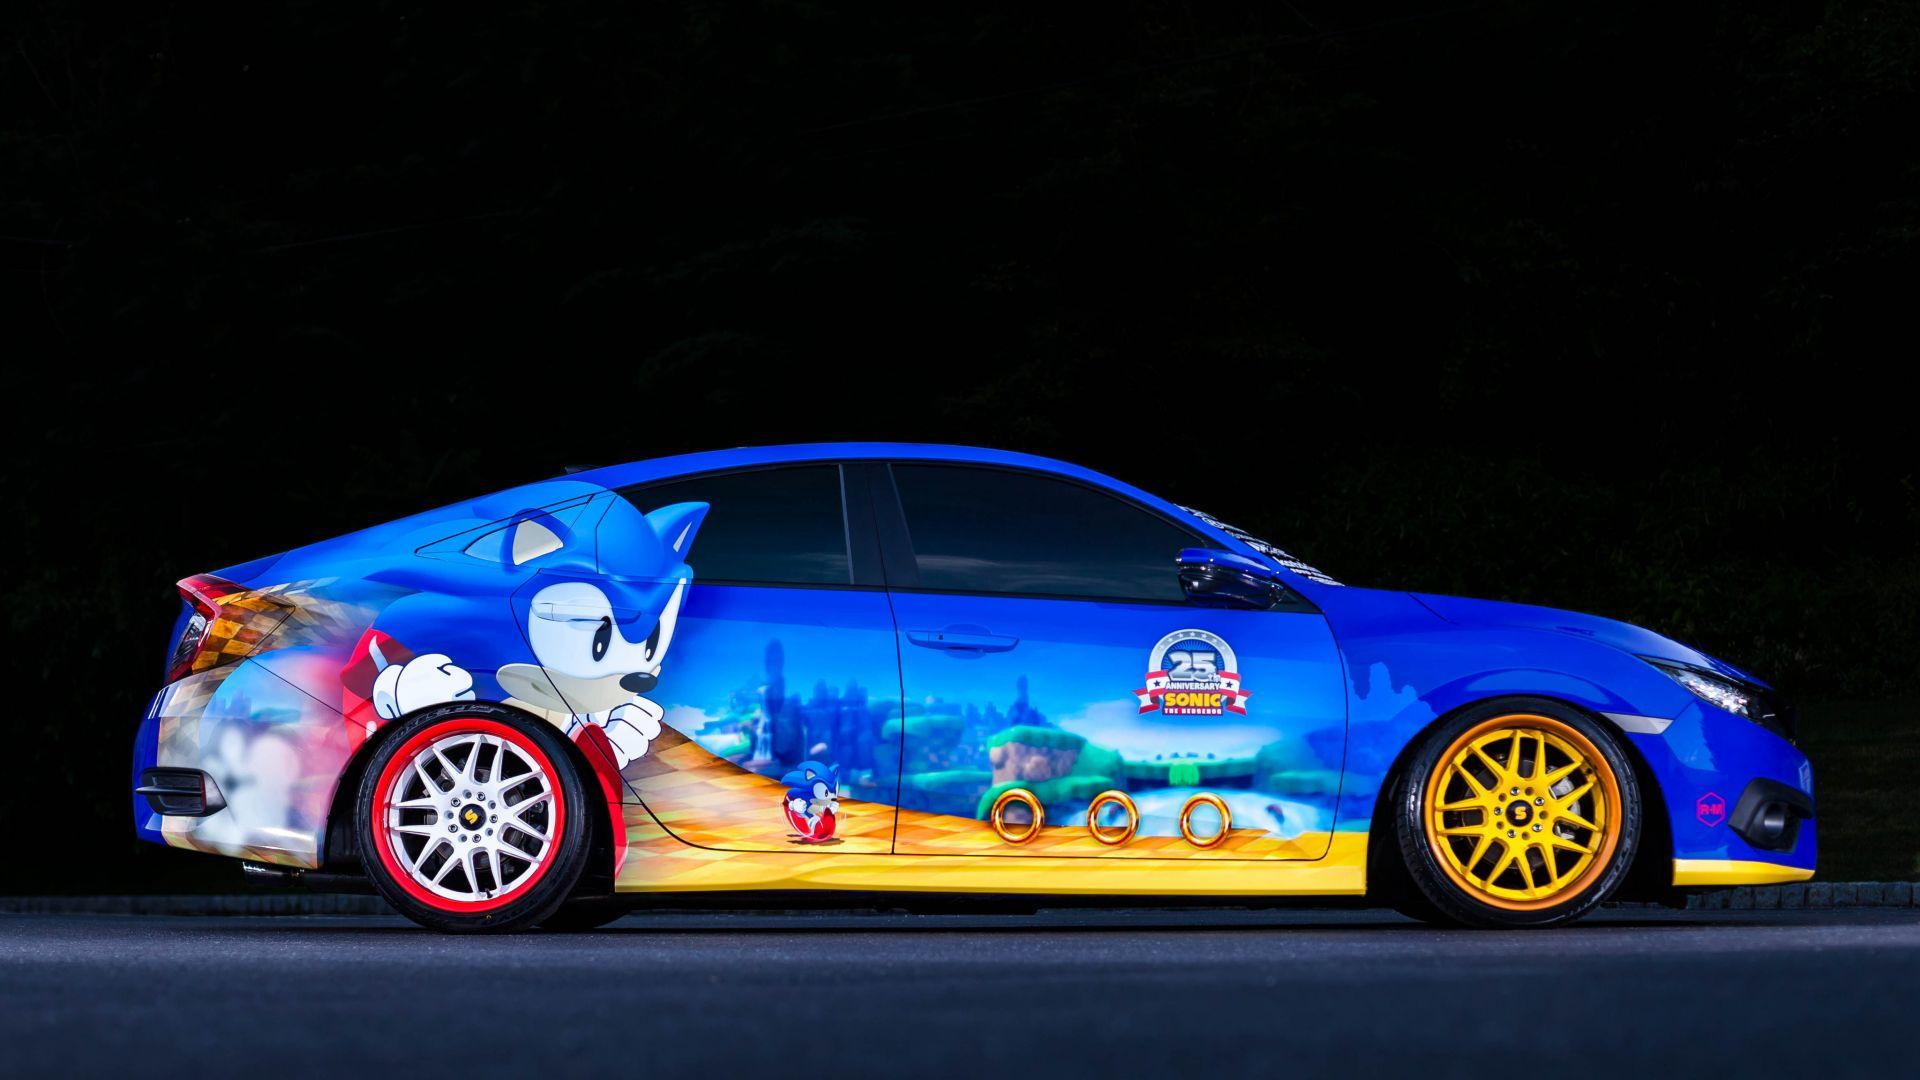 Wallpaper Honda's Sonic Civic, Sedan, Blue, Sonic, Cars